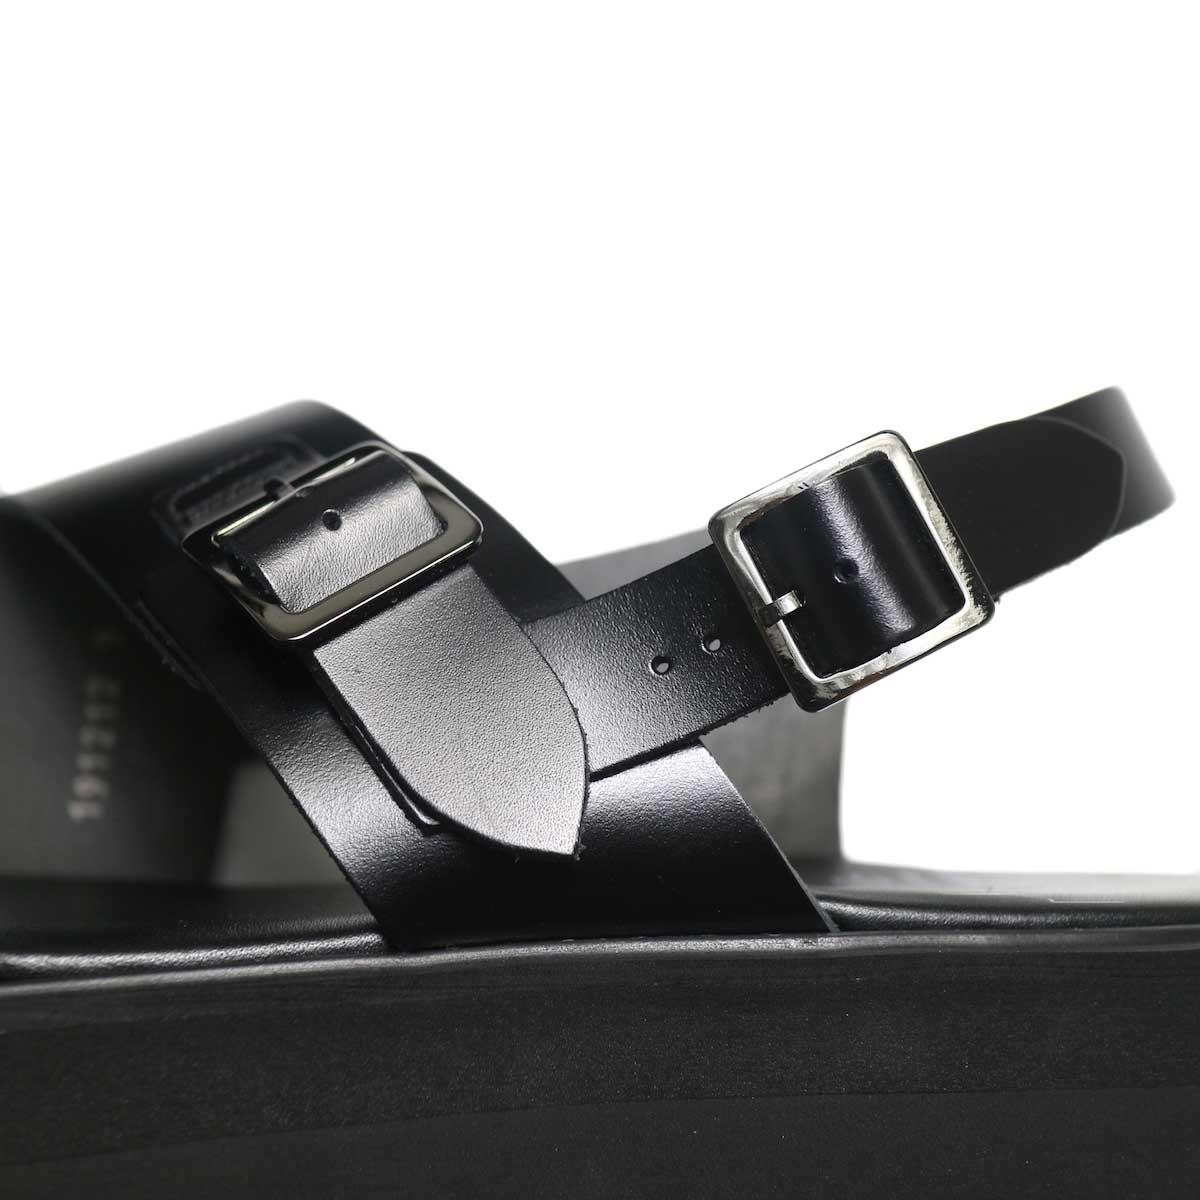 foot the coacher / SS BELT SANDALS (GLOXI CUT SOLE) -Black ストラップ